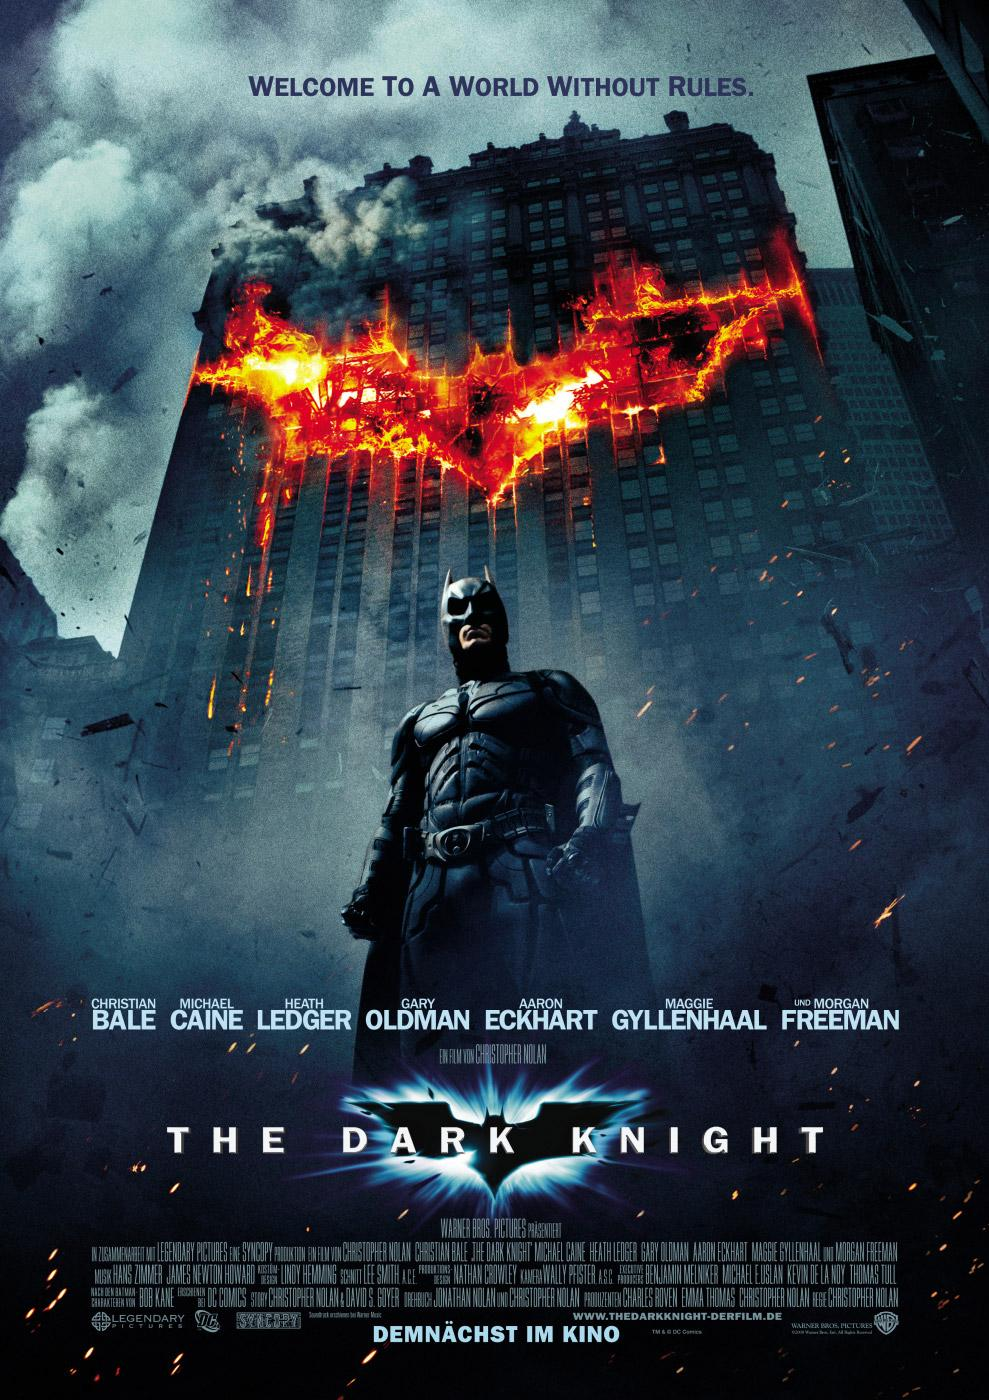 The Dark Knight (Poster)